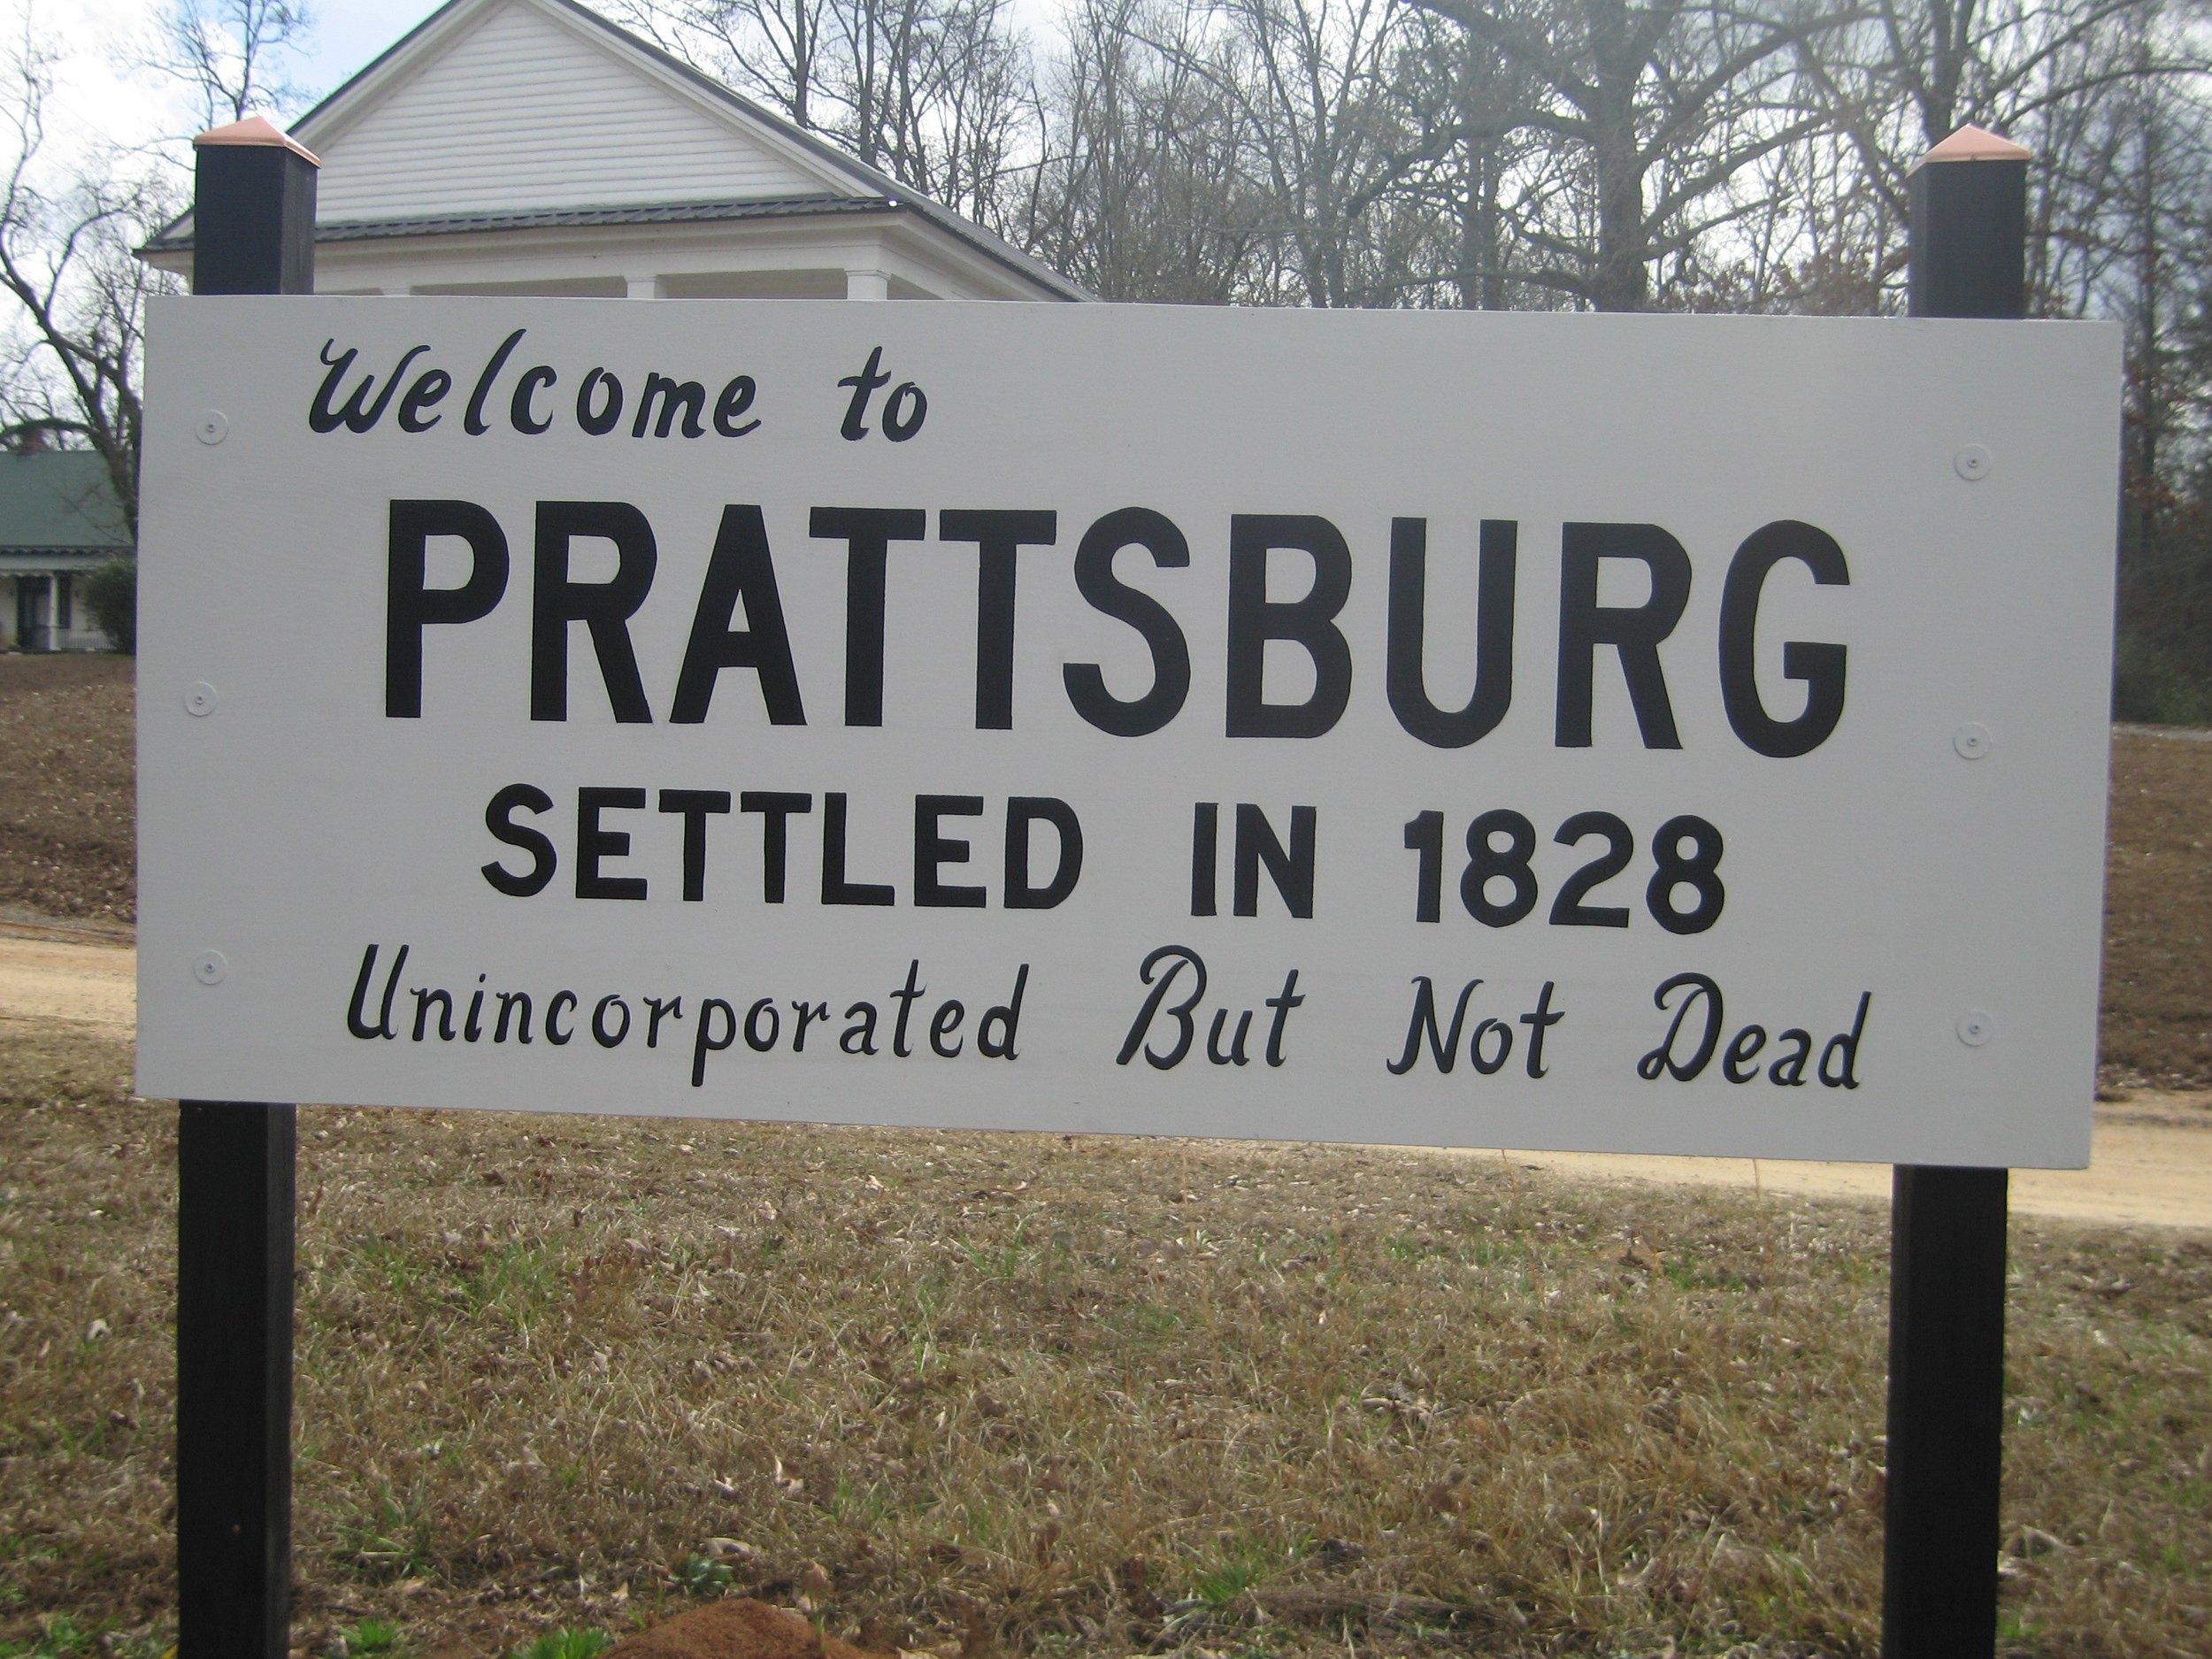 Prattsburg, Georgia